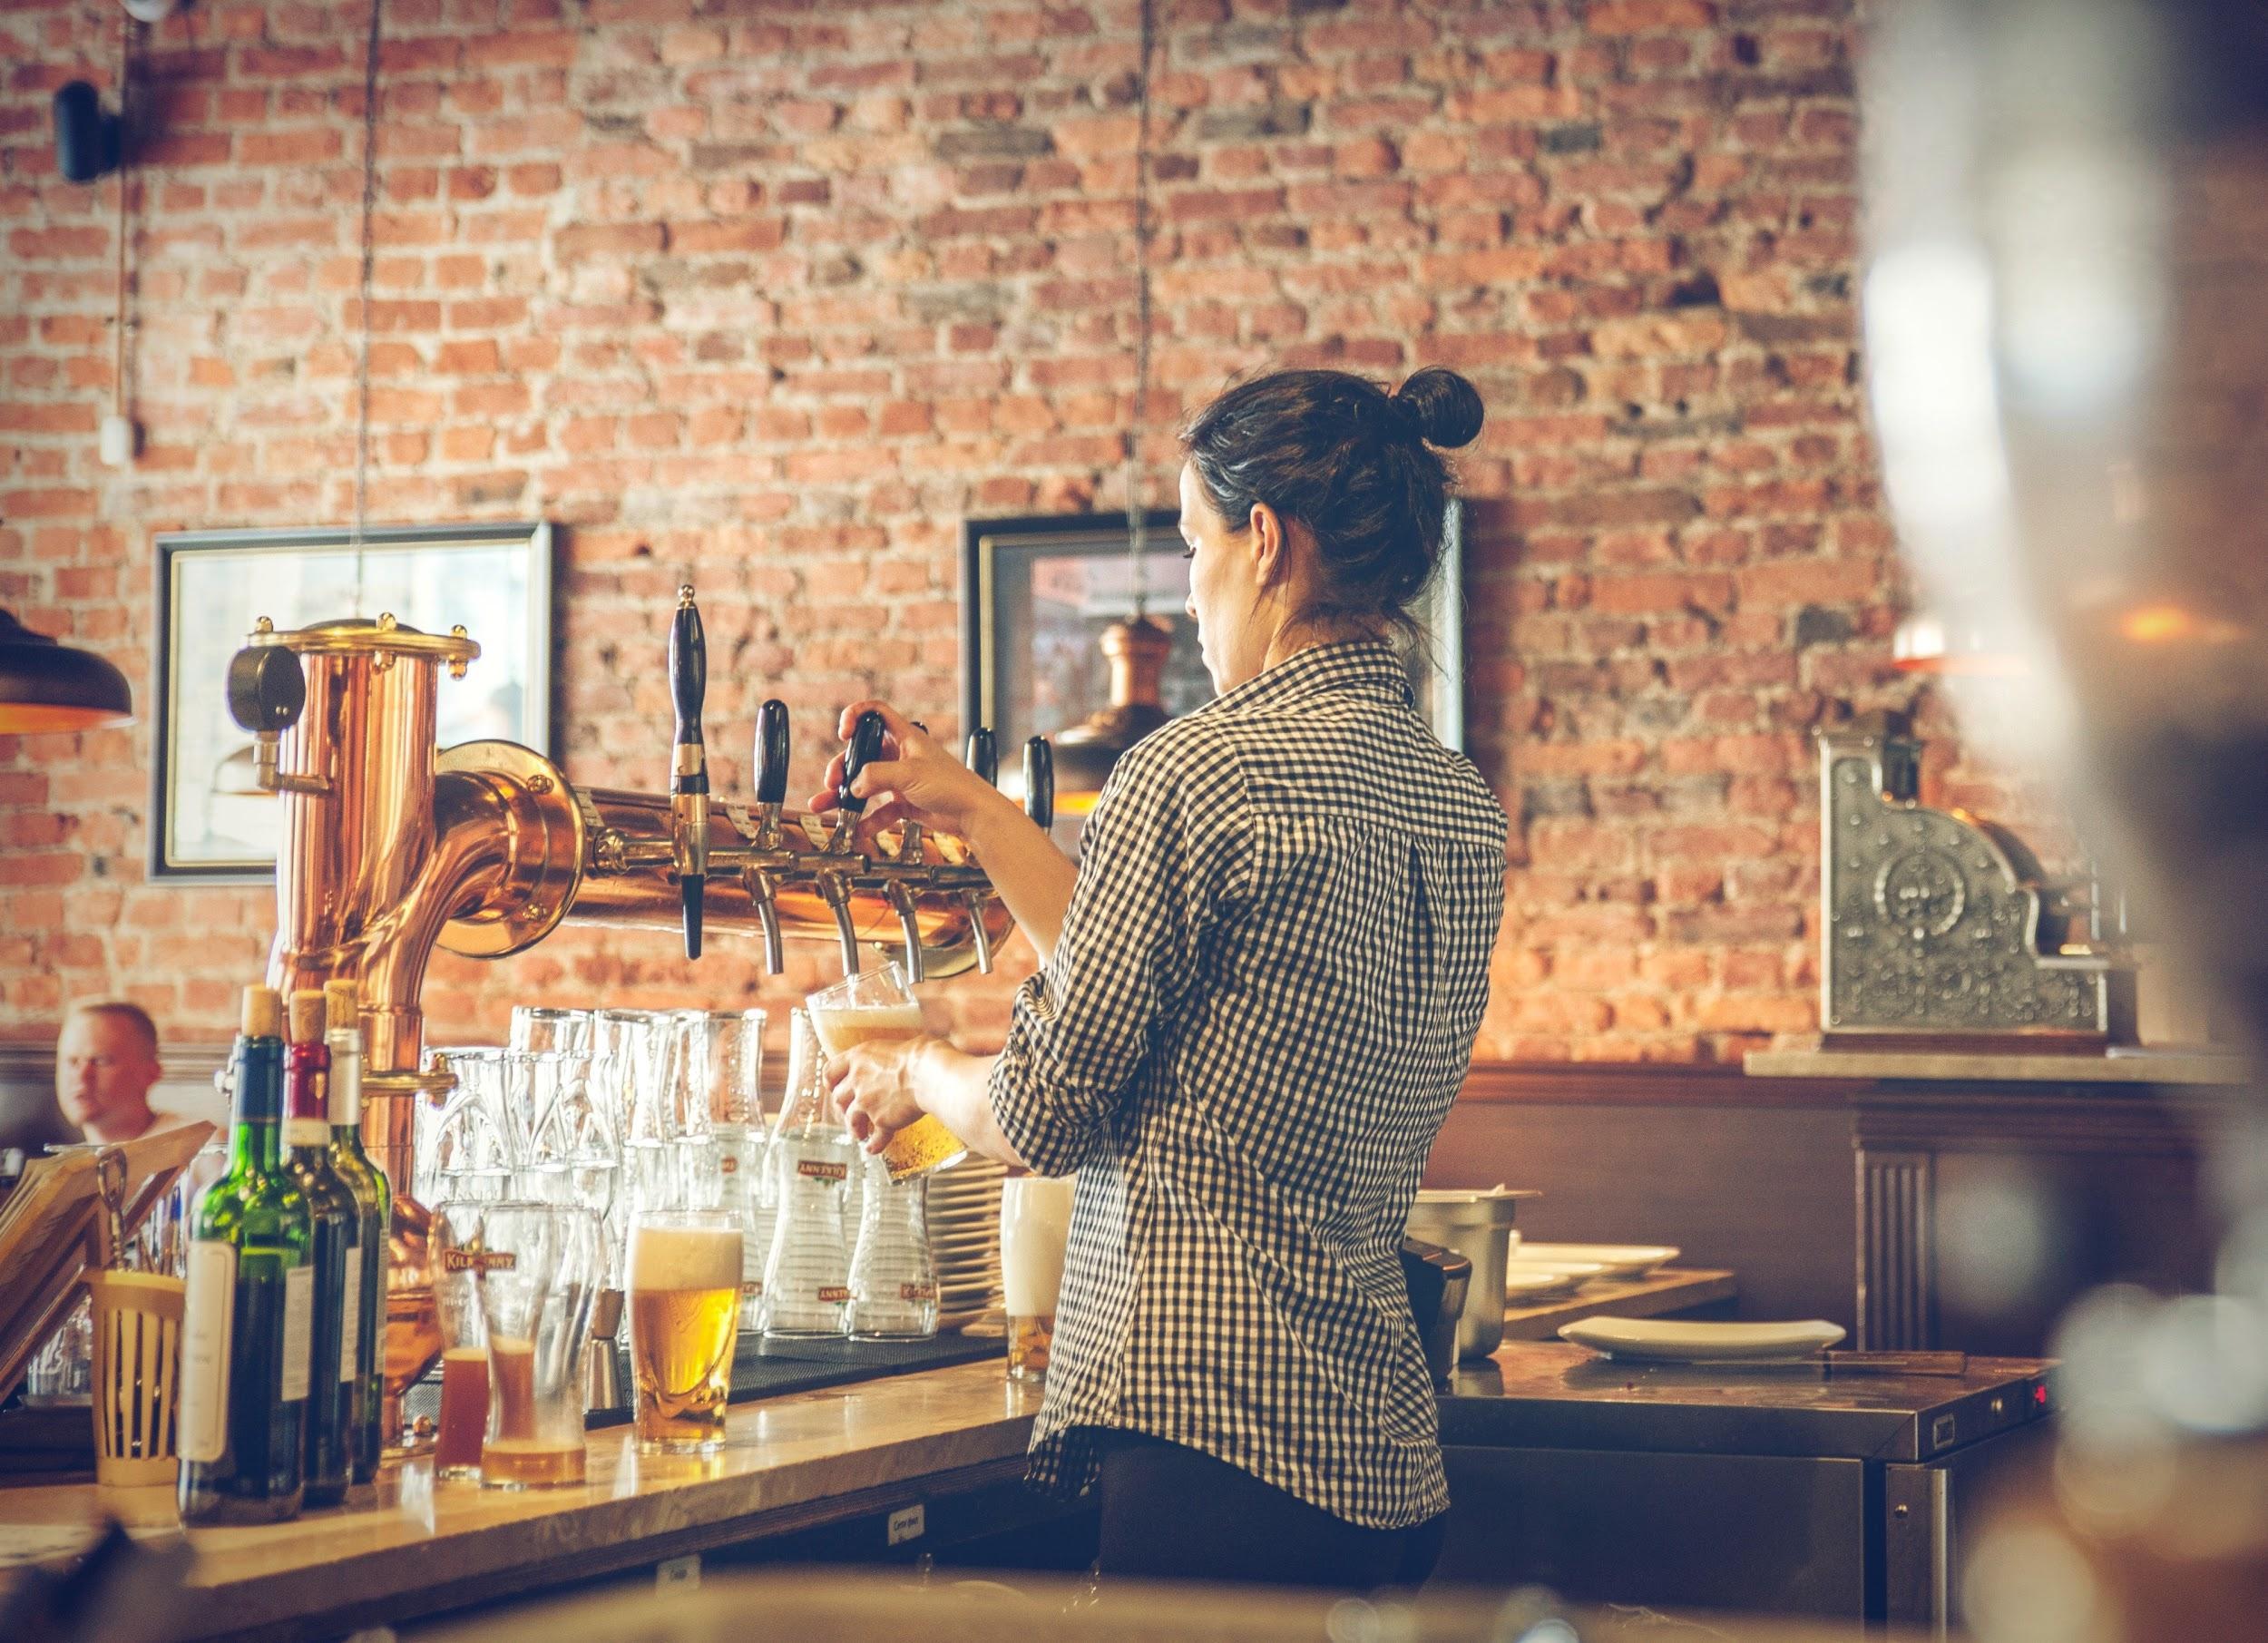 A lady bartender filling up some beer